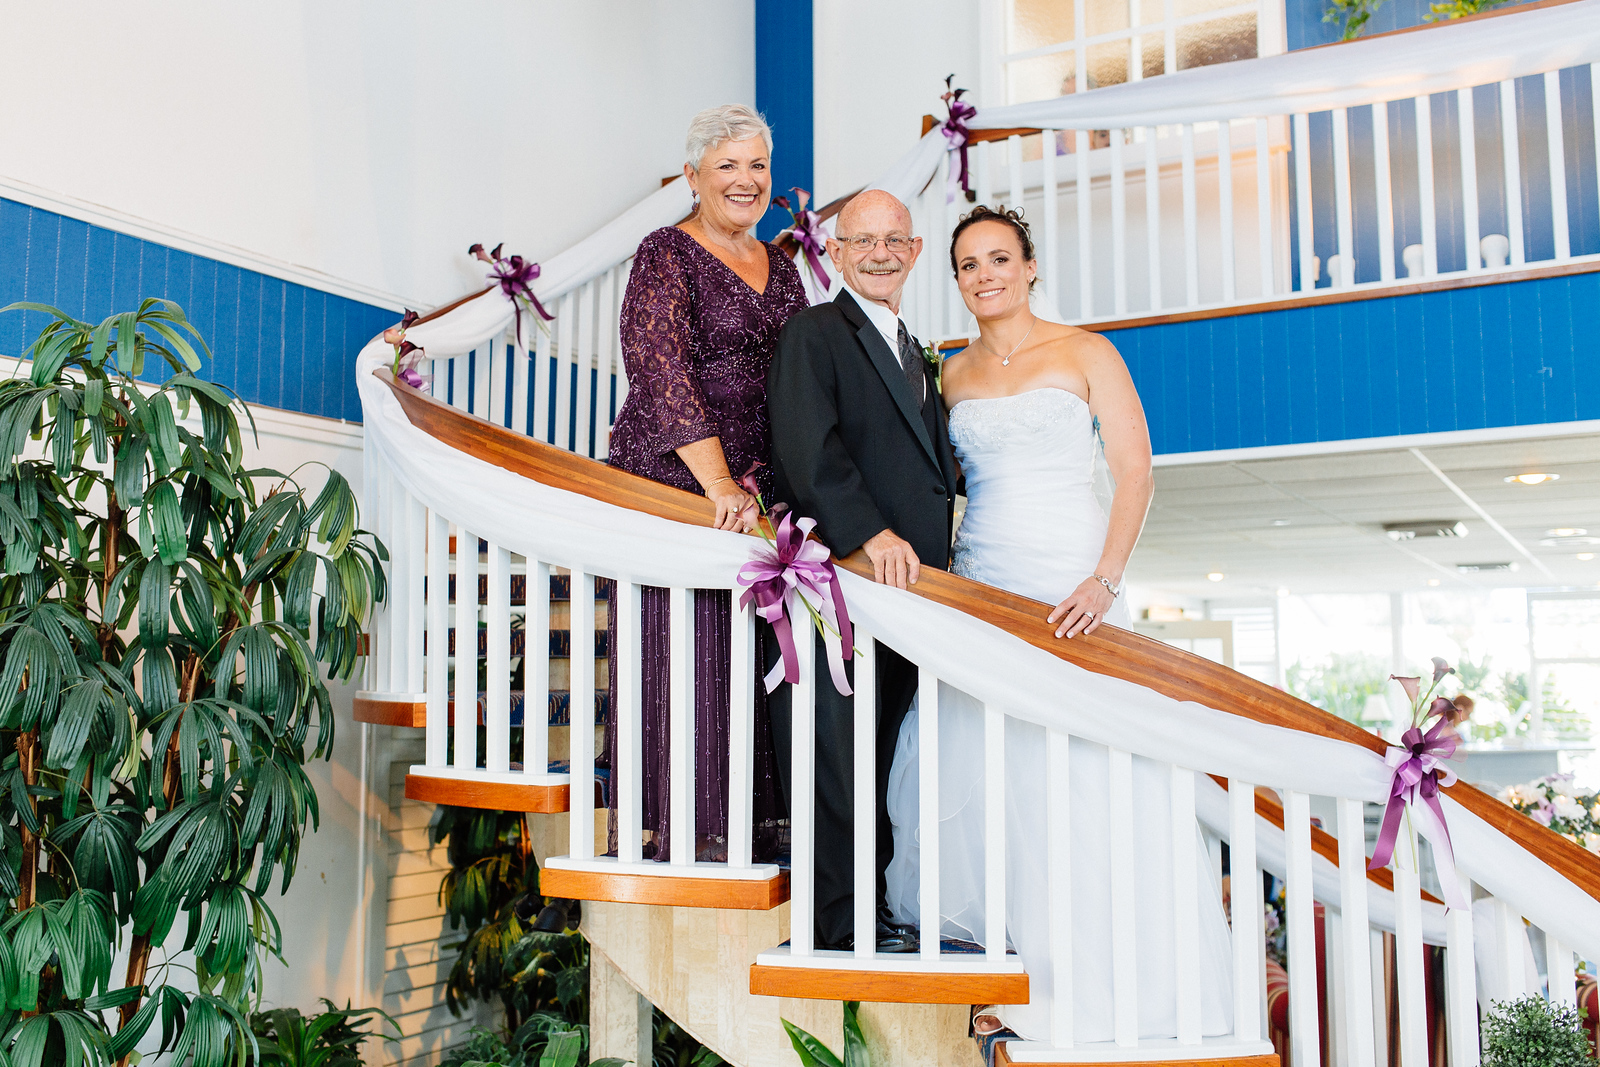 Andreo-South-Florida-Wedding-Photographer-19675